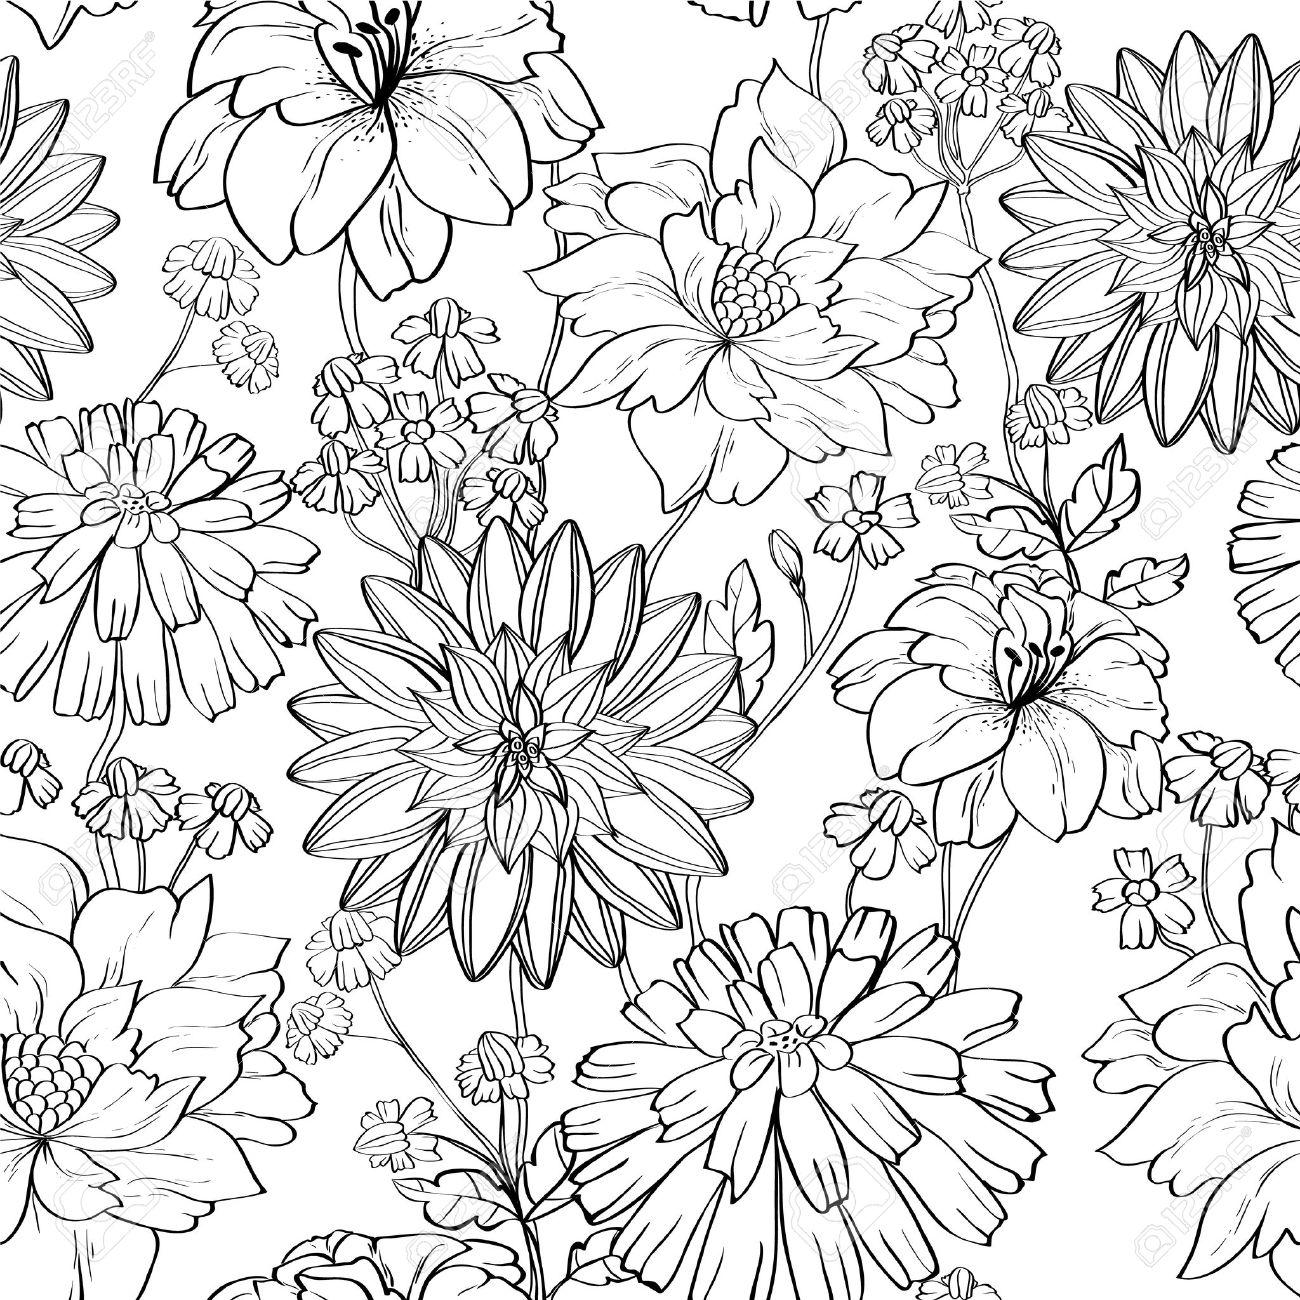 Flower Drawing Wallpaper At Getdrawings